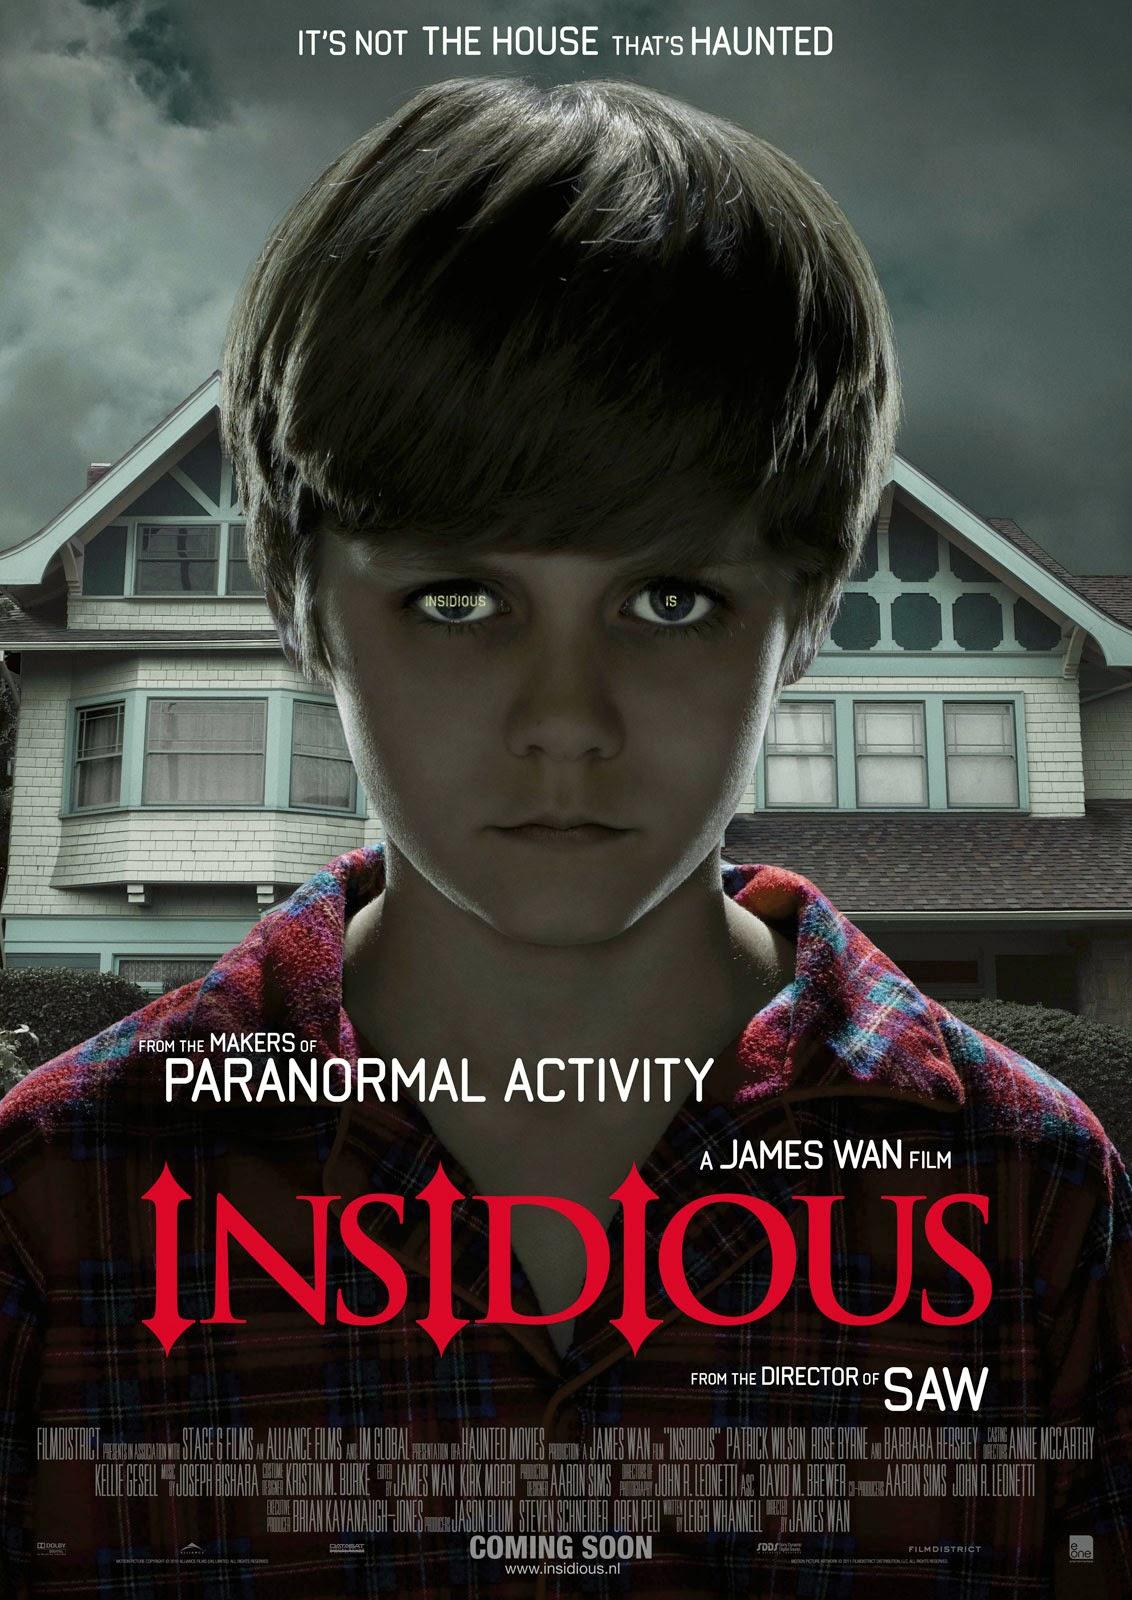 Insidious 2010